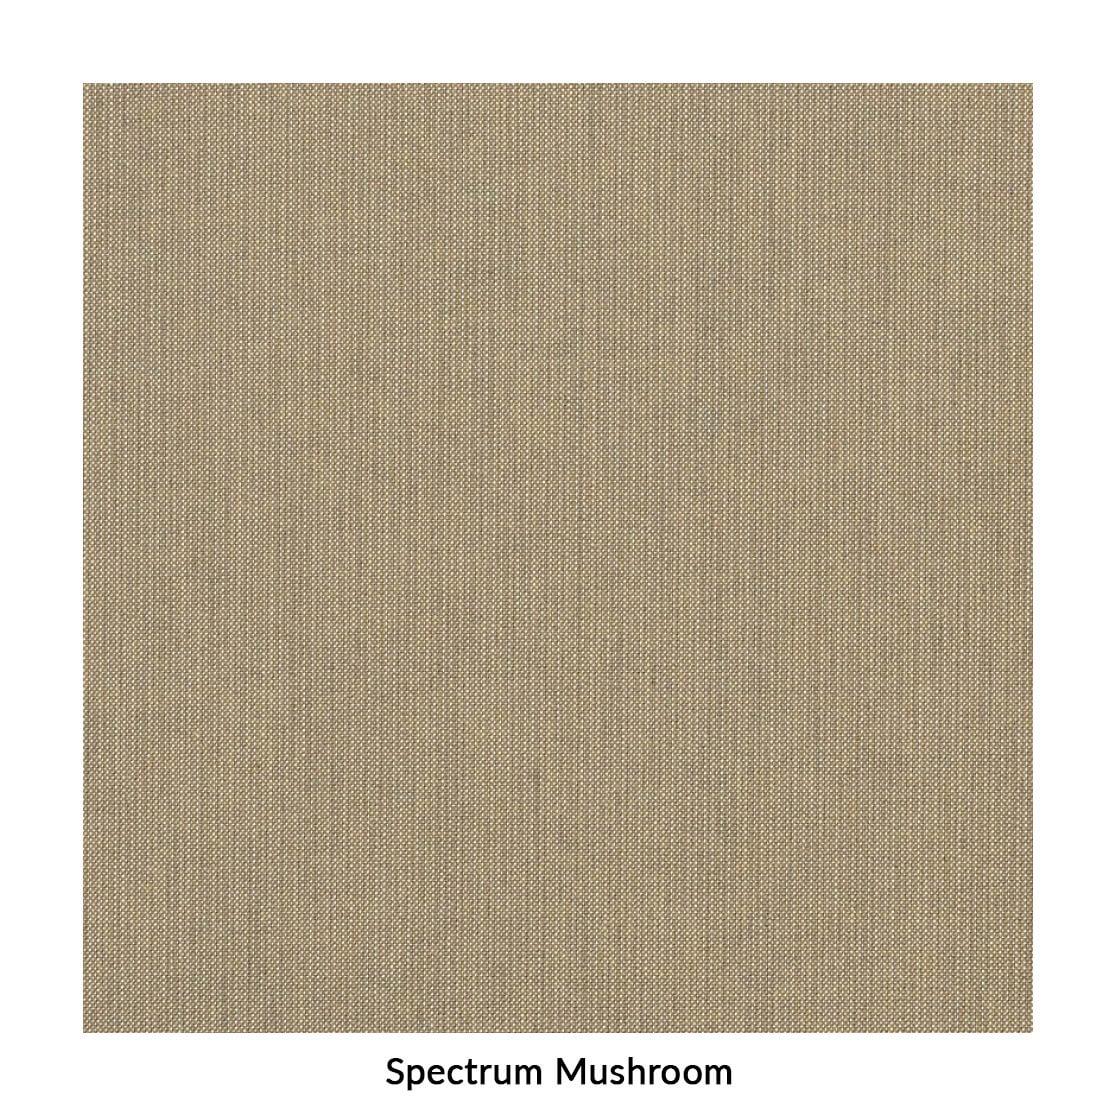 spectrum-mushroom.jpg